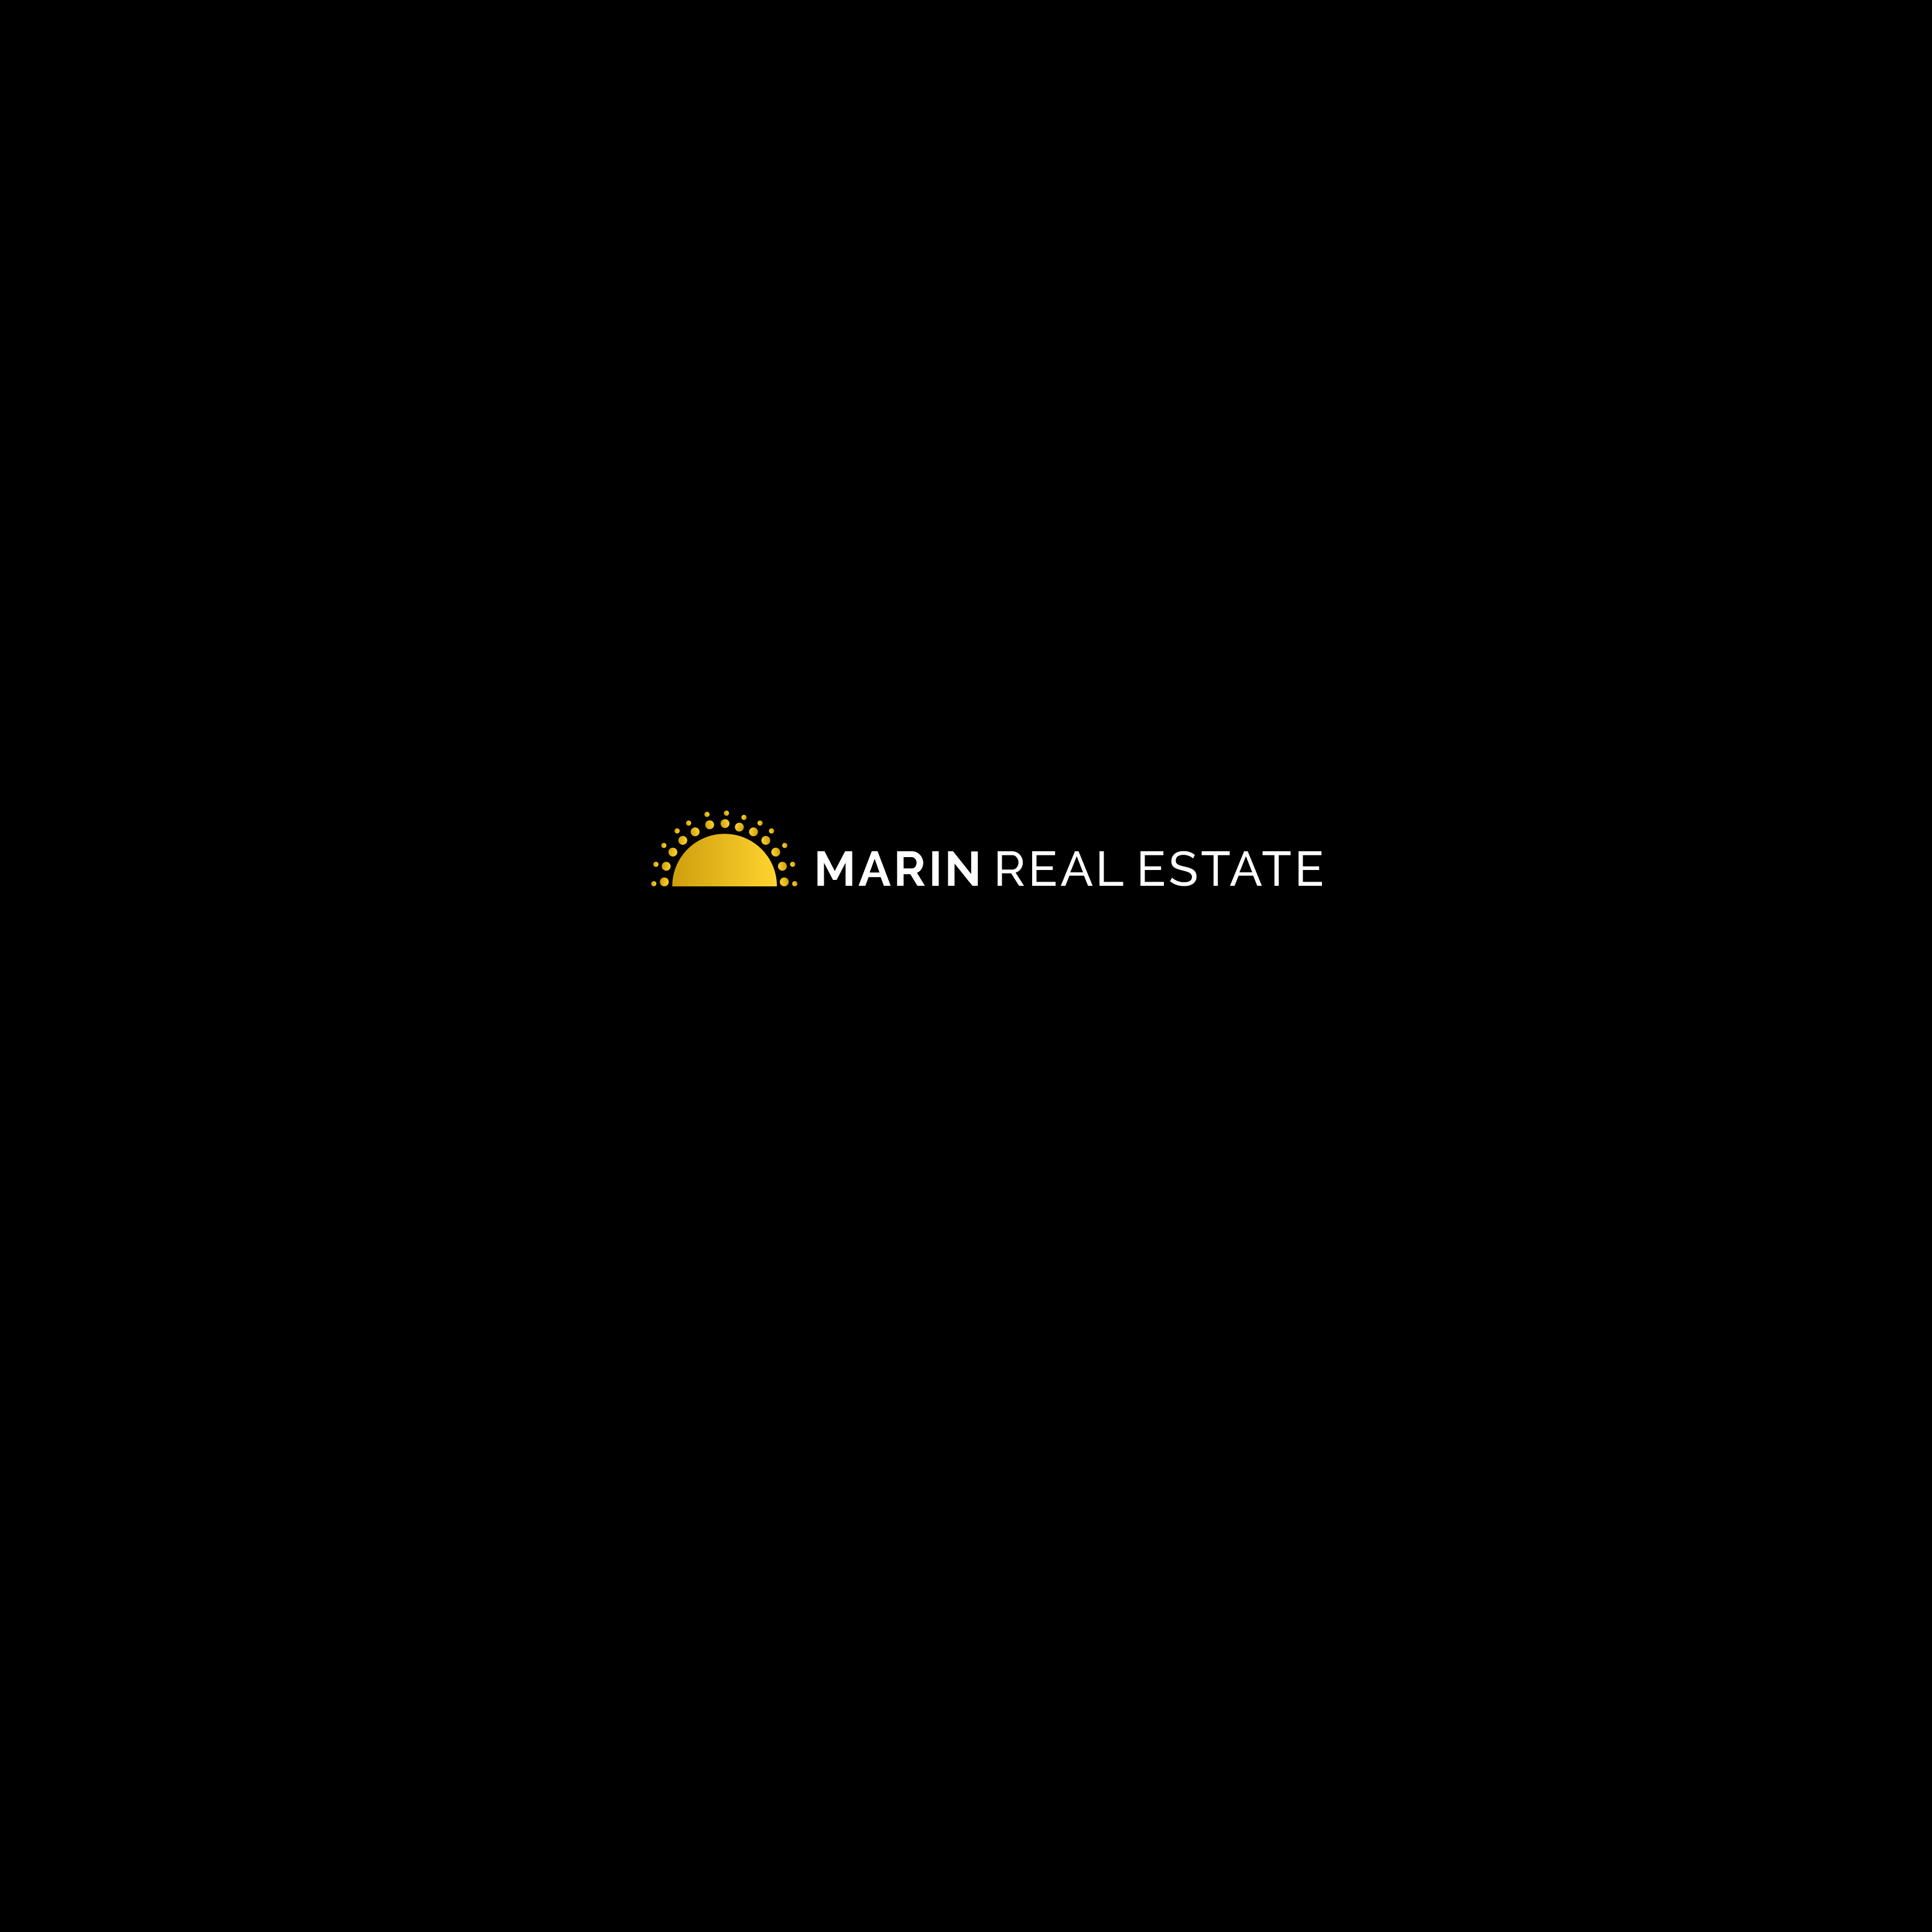 Make Marin Real Estate a Chic Luxury Logo